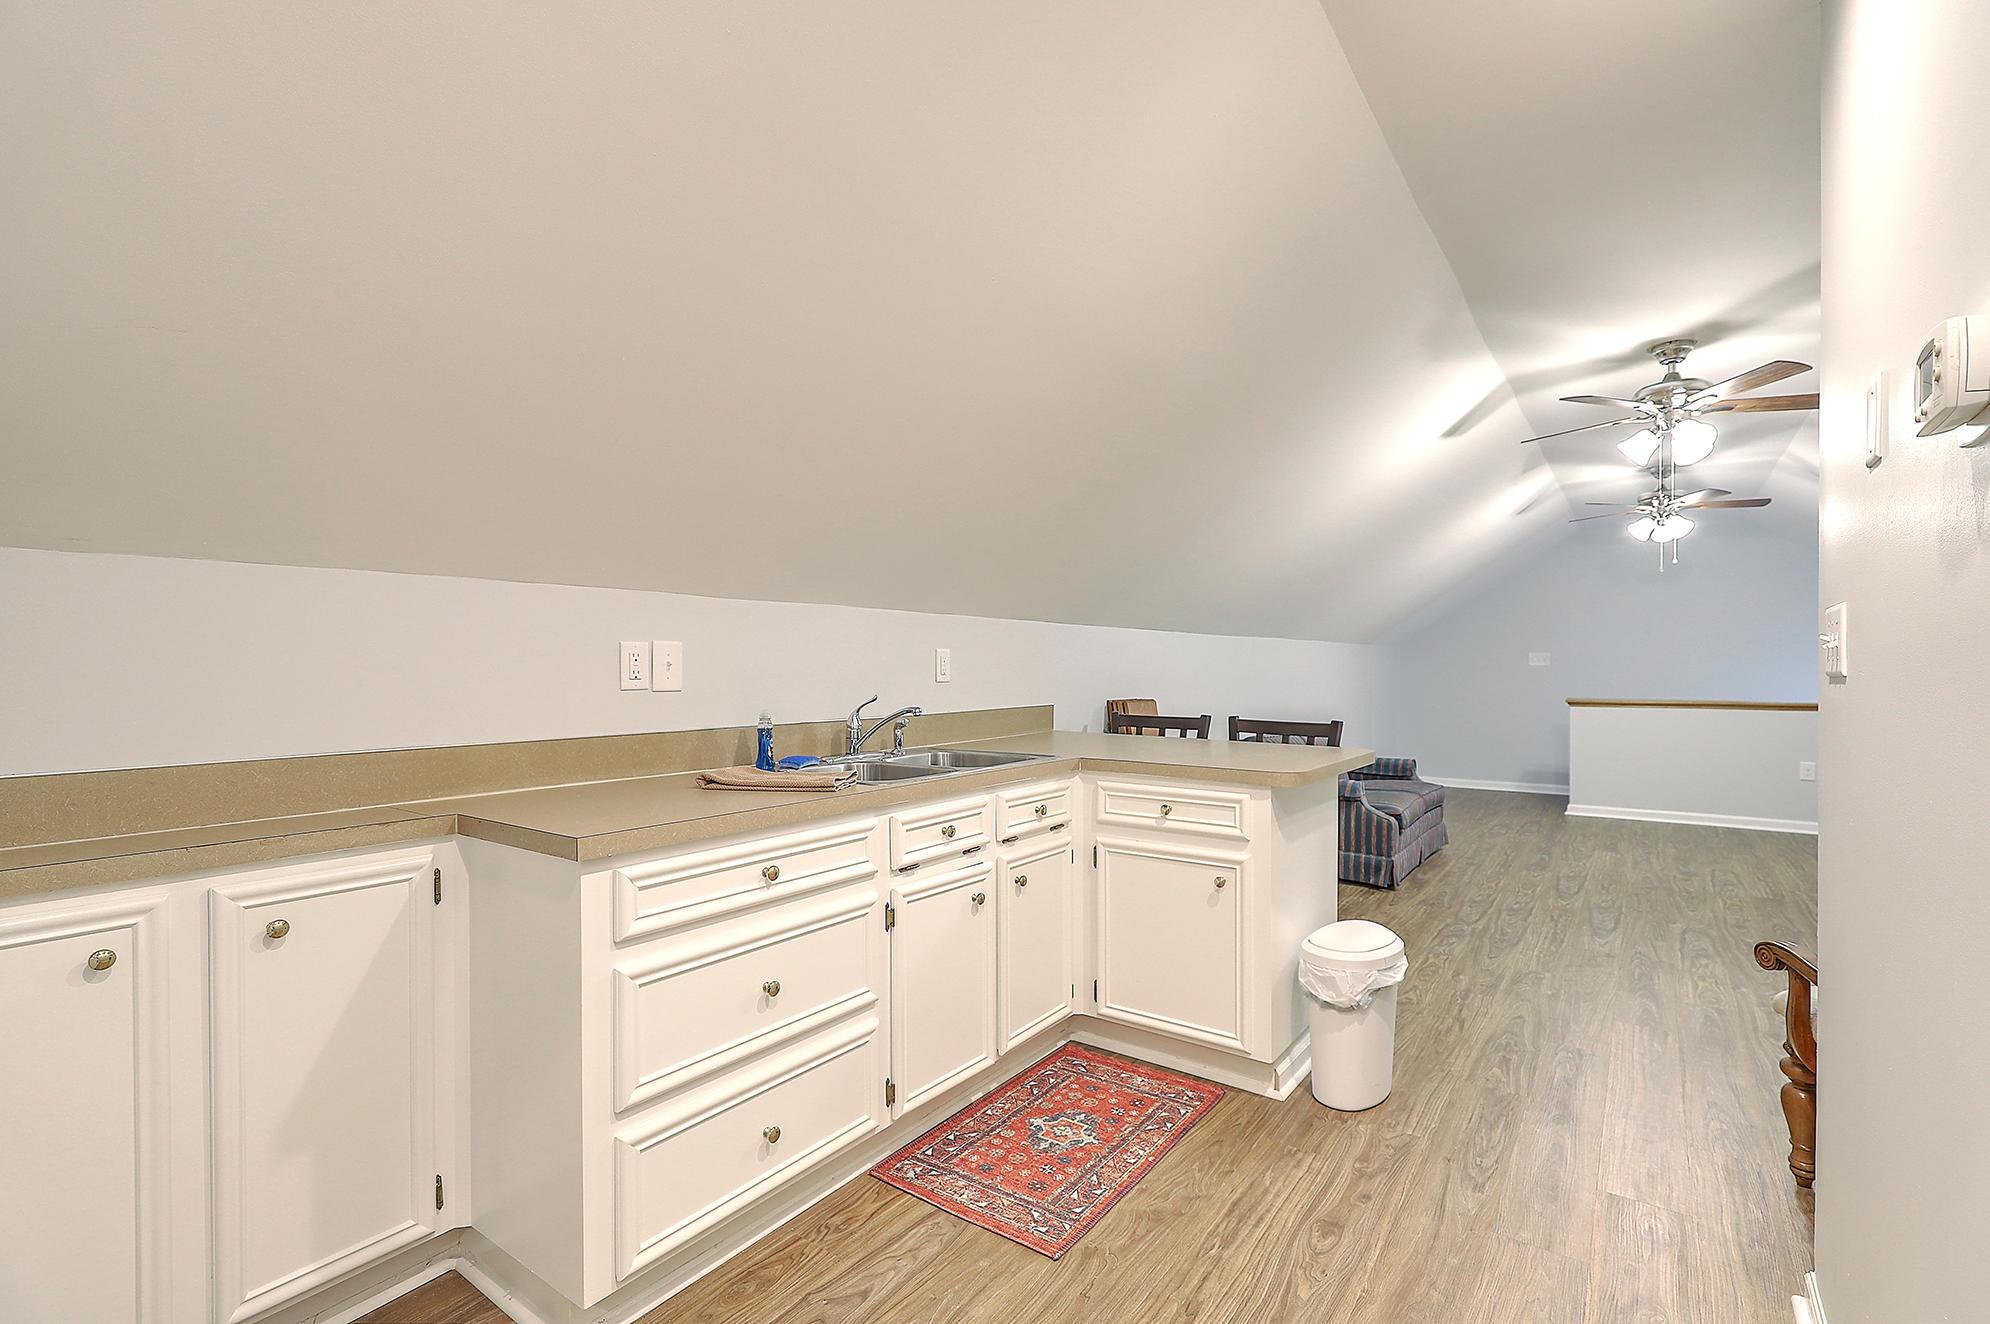 Summerville Homes For Sale - 102 Hickory, Summerville, SC - 80